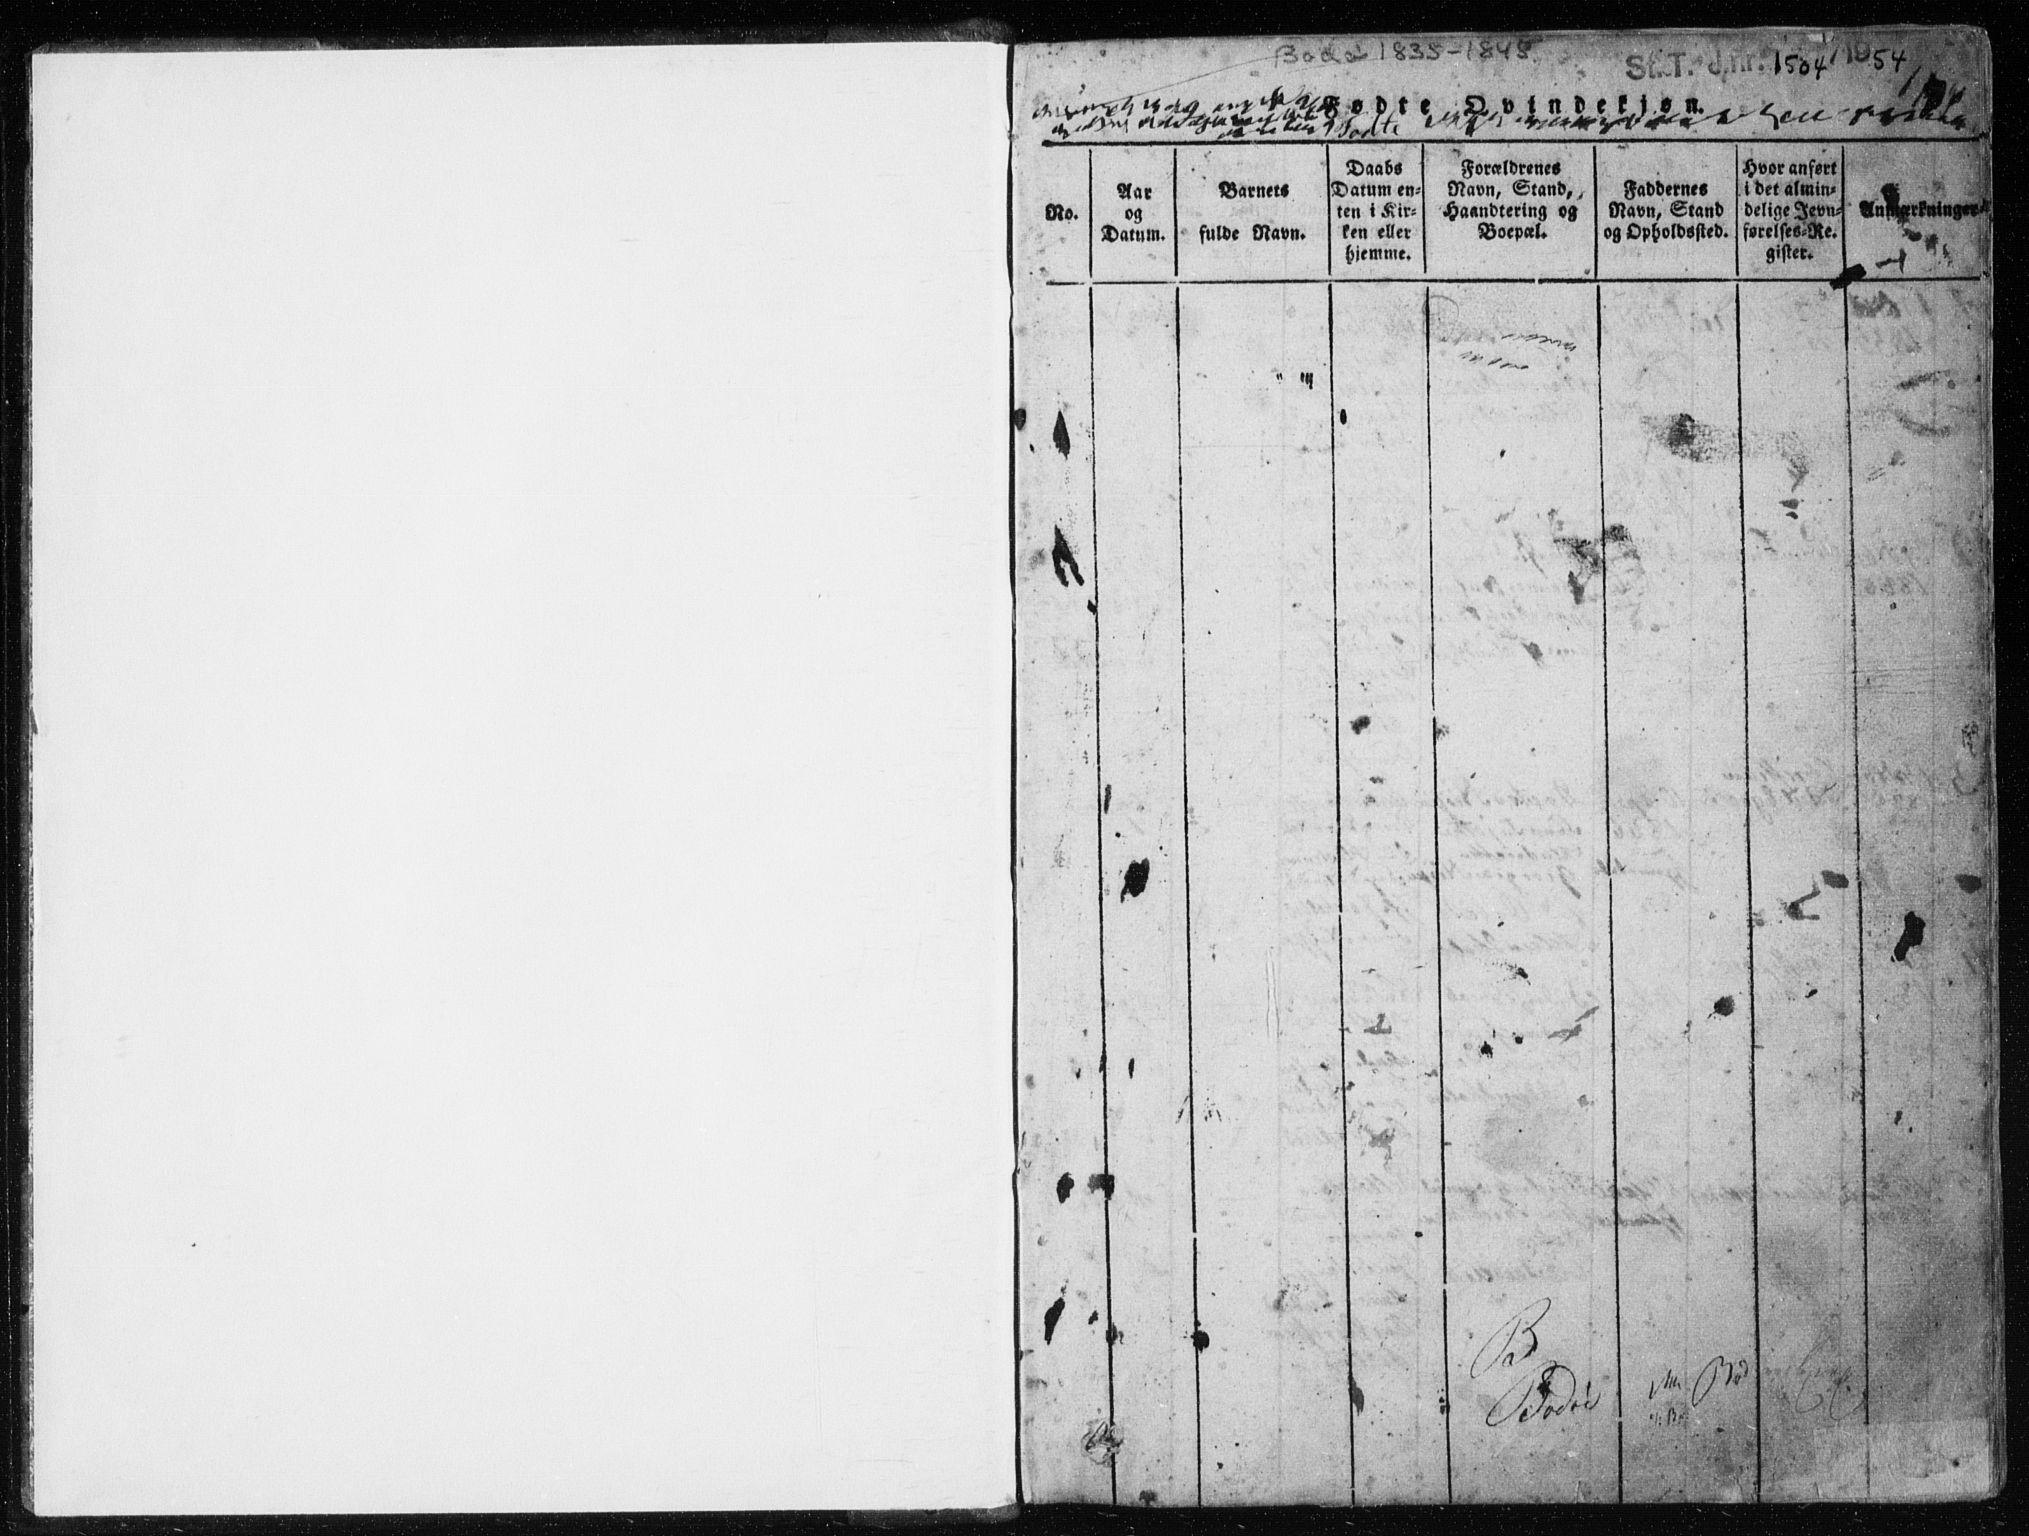 SAT, Ministerialprotokoller, klokkerbøker og fødselsregistre - Nordland, 801/L0027: Klokkerbok nr. 801C02, 1835-1845, s. 0-1